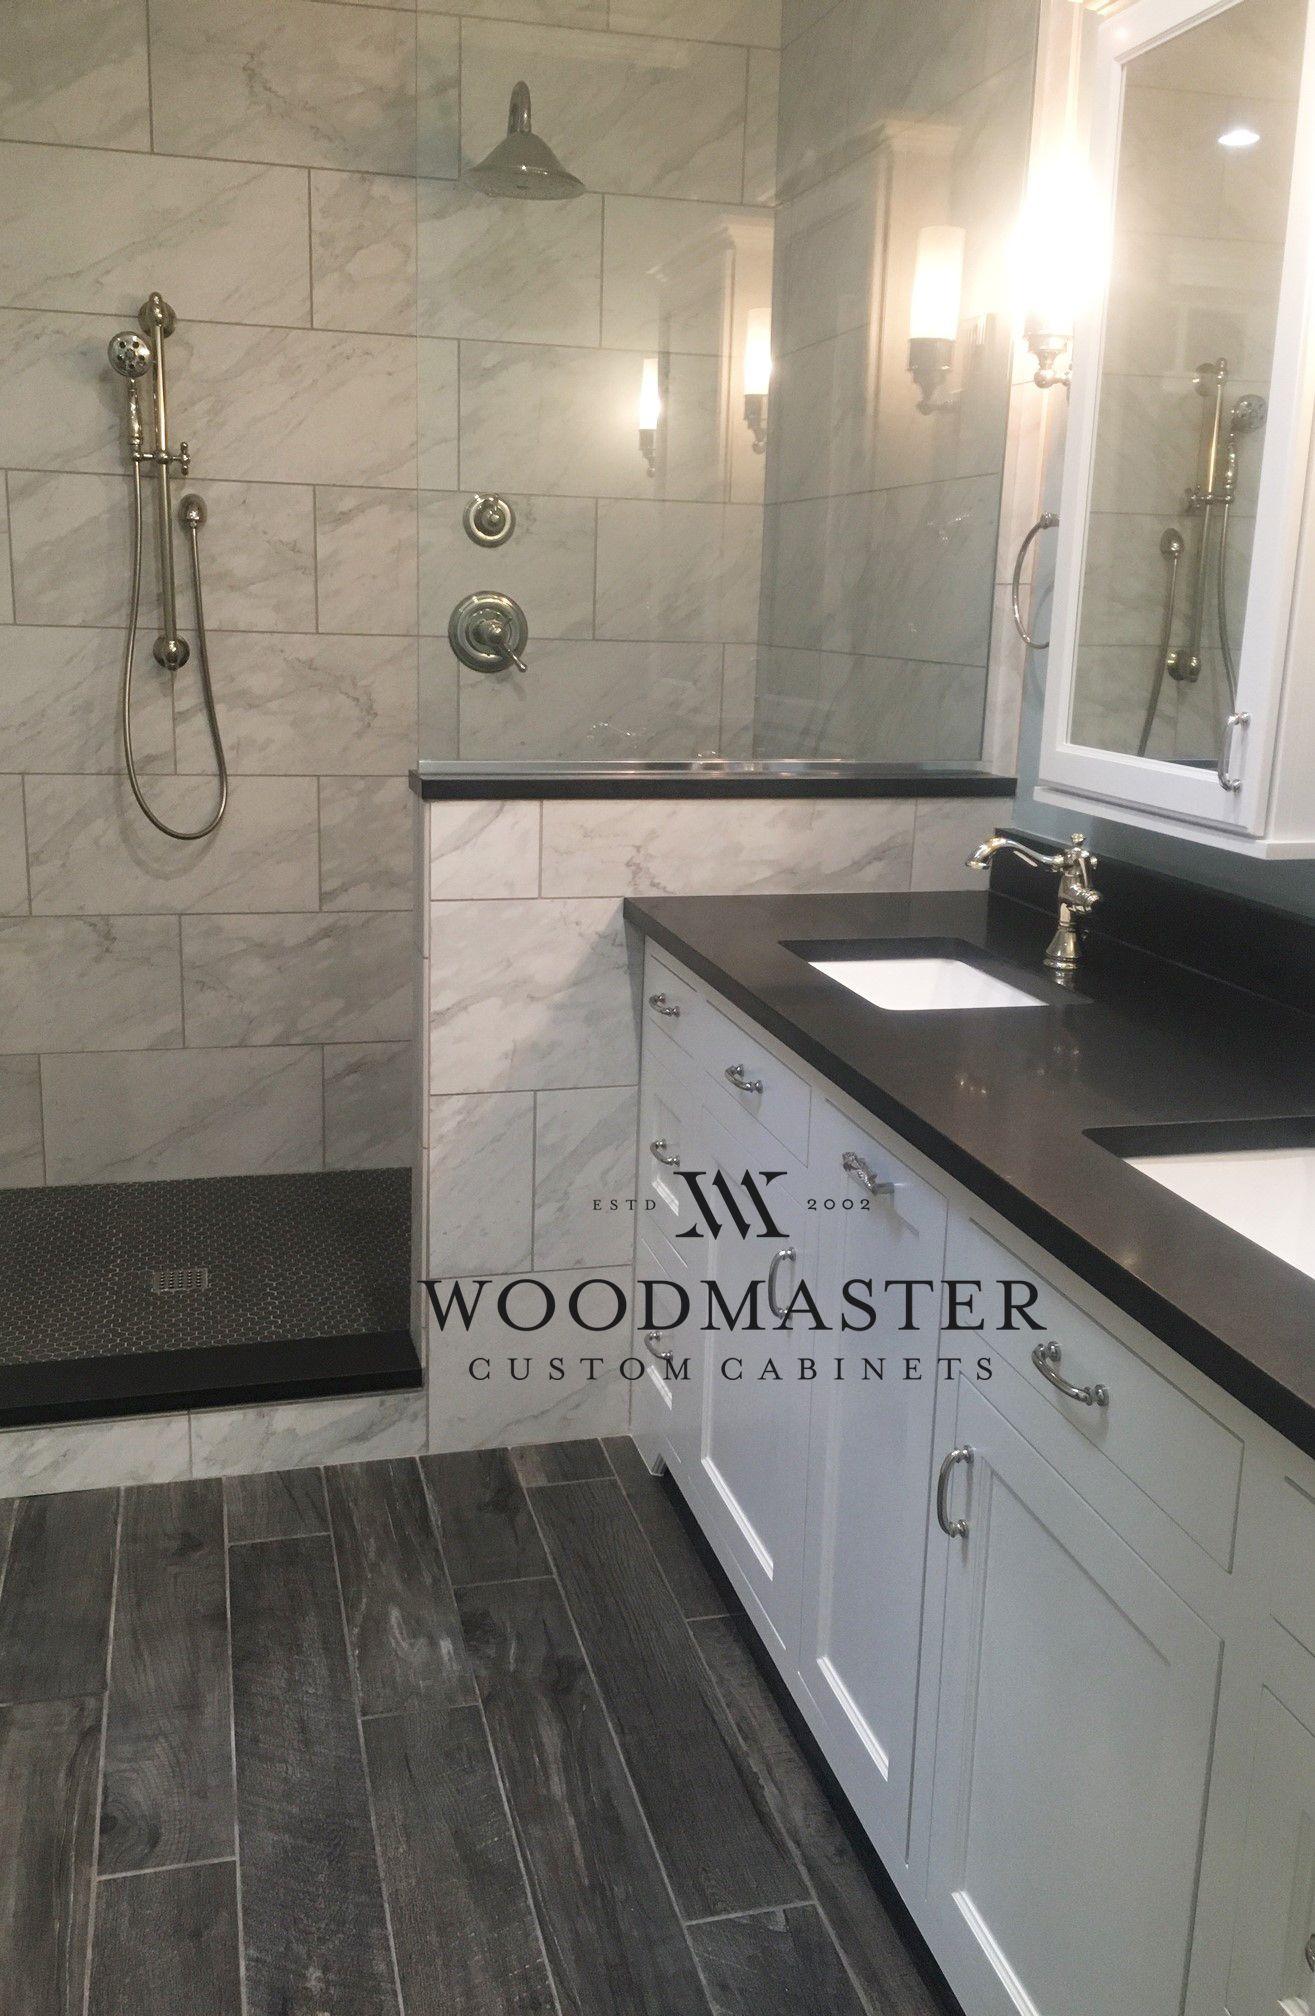 Woodmaster Woodworks custom bathroom cabinets